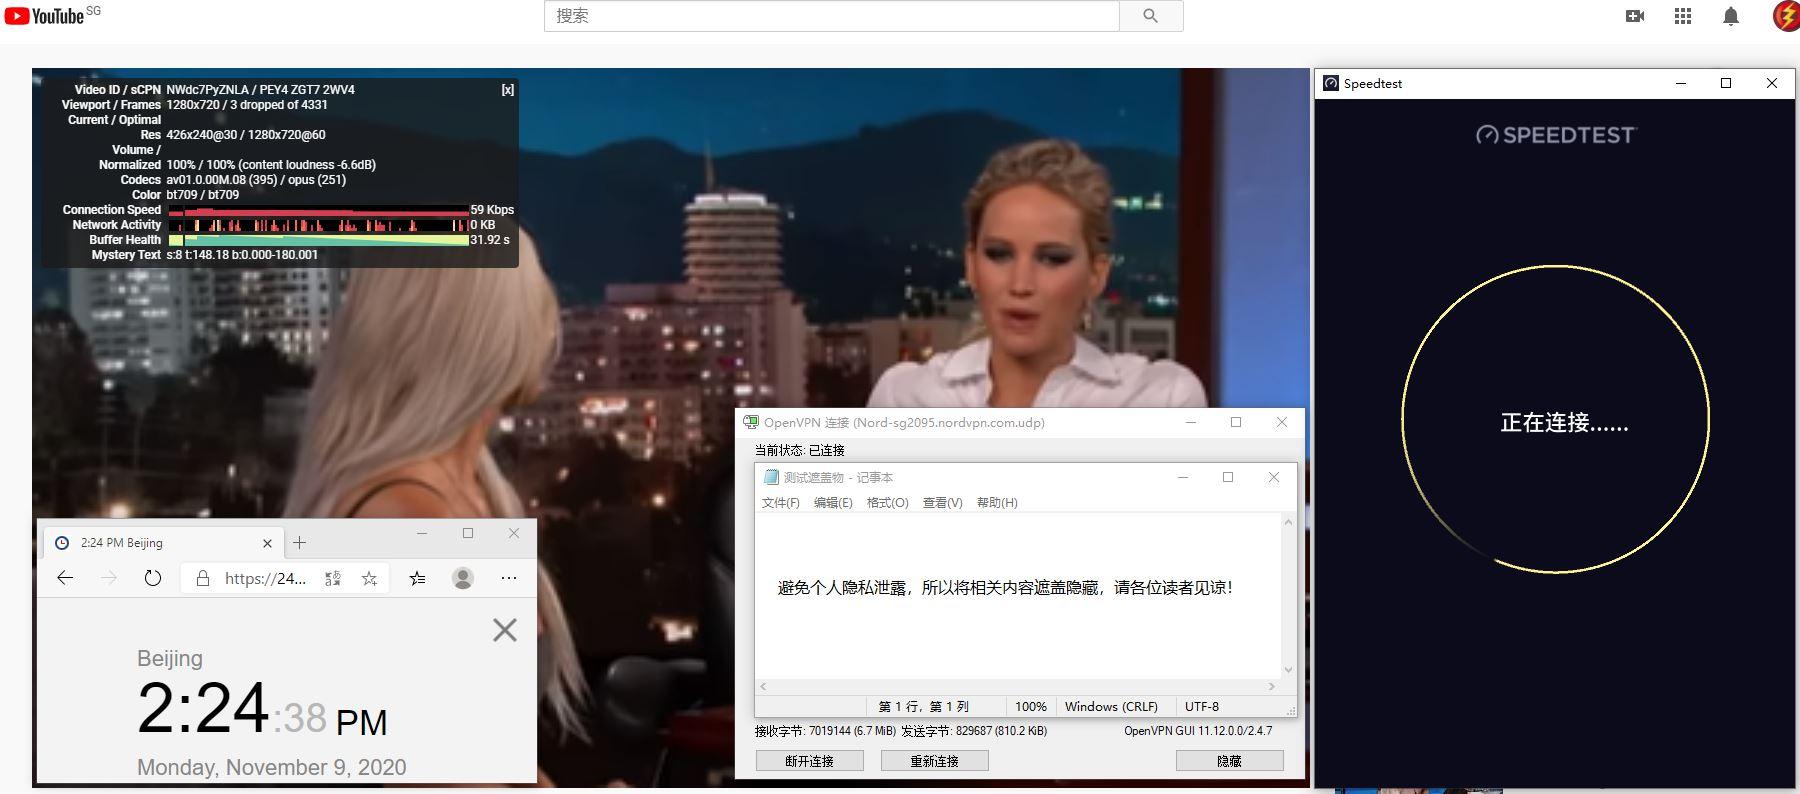 Windows10 NordVPN OpenVPN Gui Sg2095 服务器 中国VPN 翻墙 科学上网 测试 - 20201109